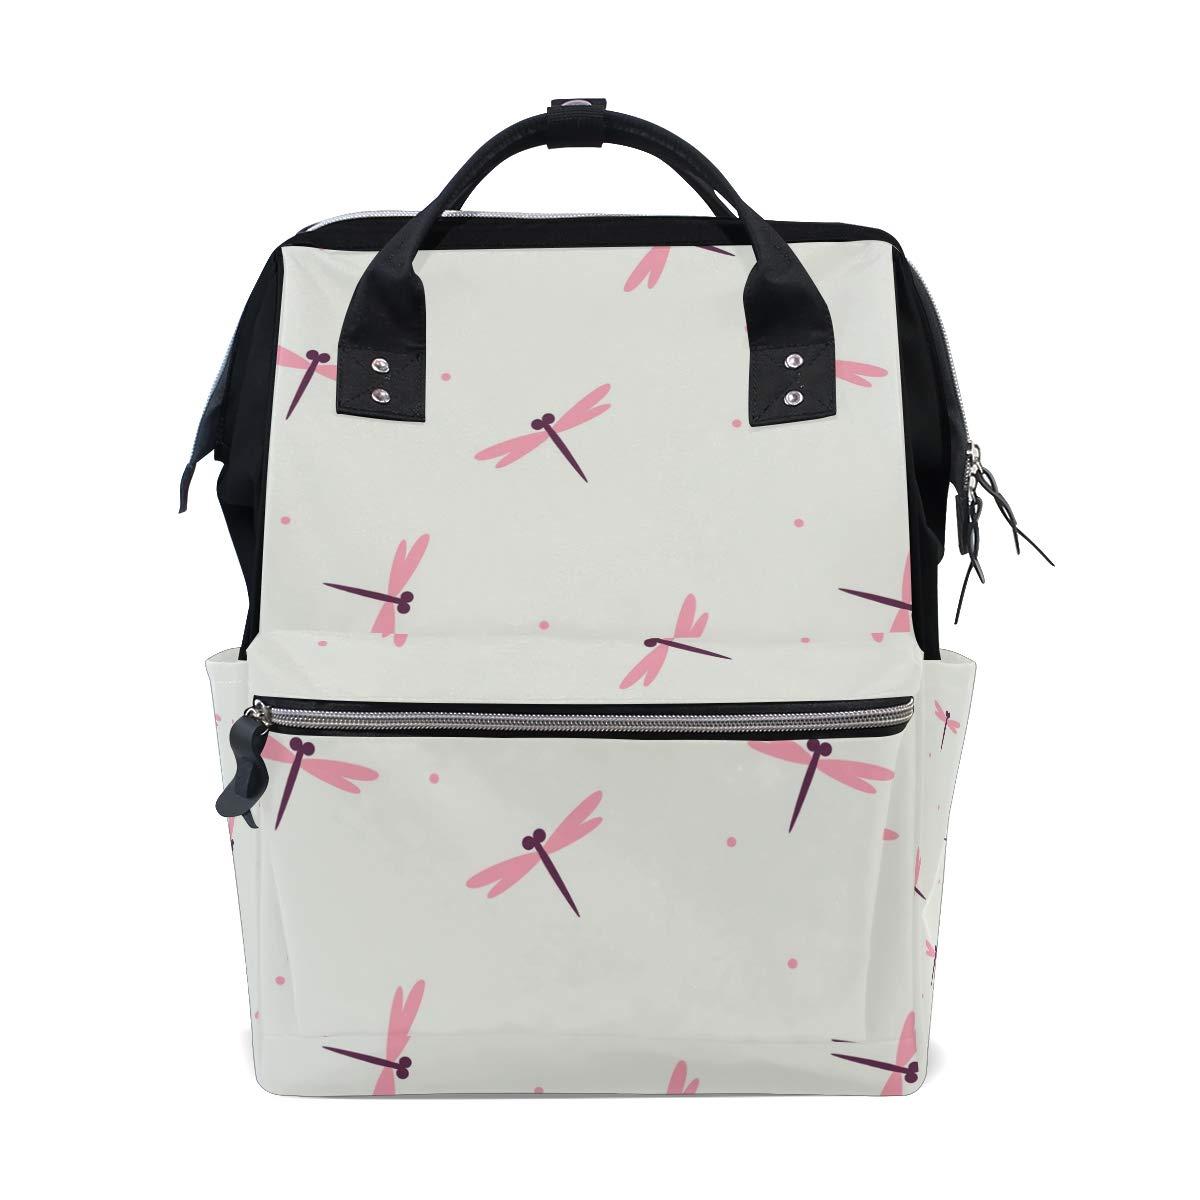 MALPLENA Daypack Adorable Pink Dragonfly School Bag Travel Backpack